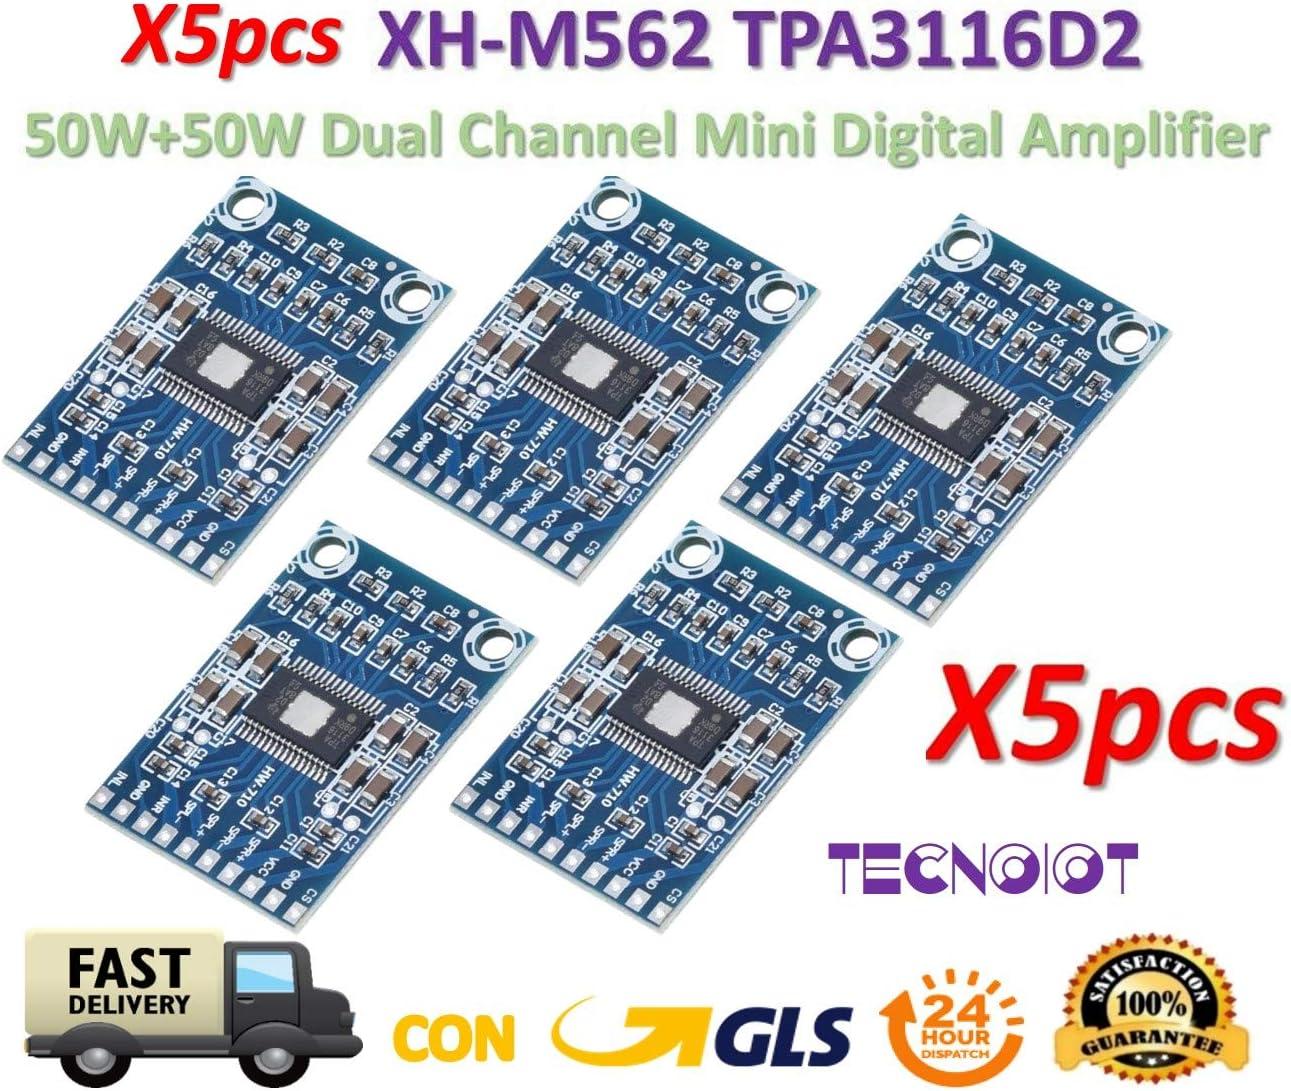 TECNOIOT 5pcs XH-M562 TPA3116D2 Digital Audio Amplifier DC 12V-24V 2x50W Dual Channel